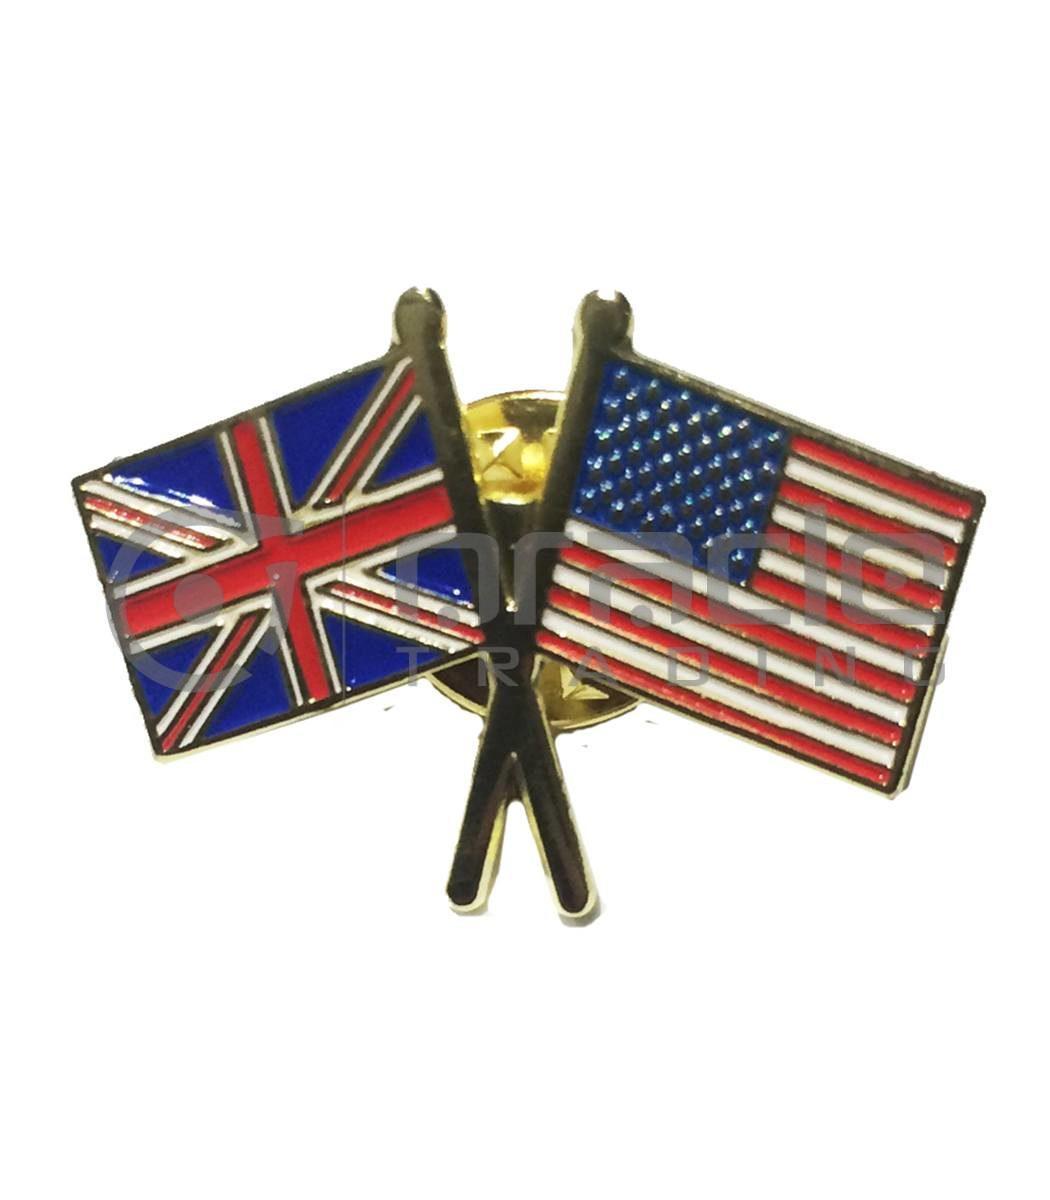 UK / USA Friendship Lapel Pin